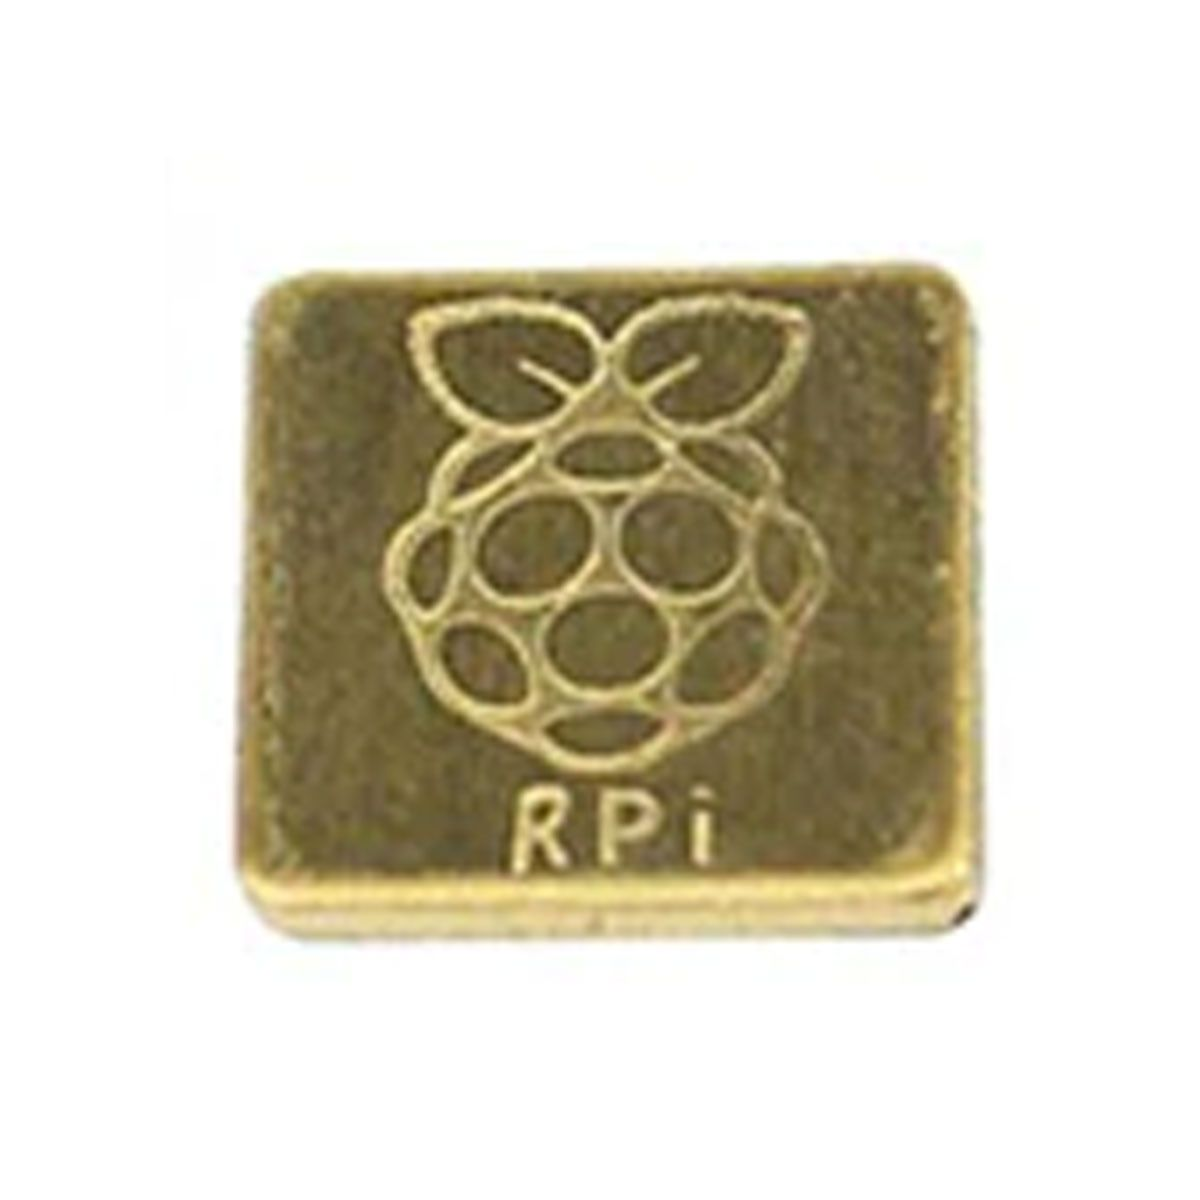 Dissipador de Calor de Cobre 12mm x 12mm para Raspberry Pi Zero